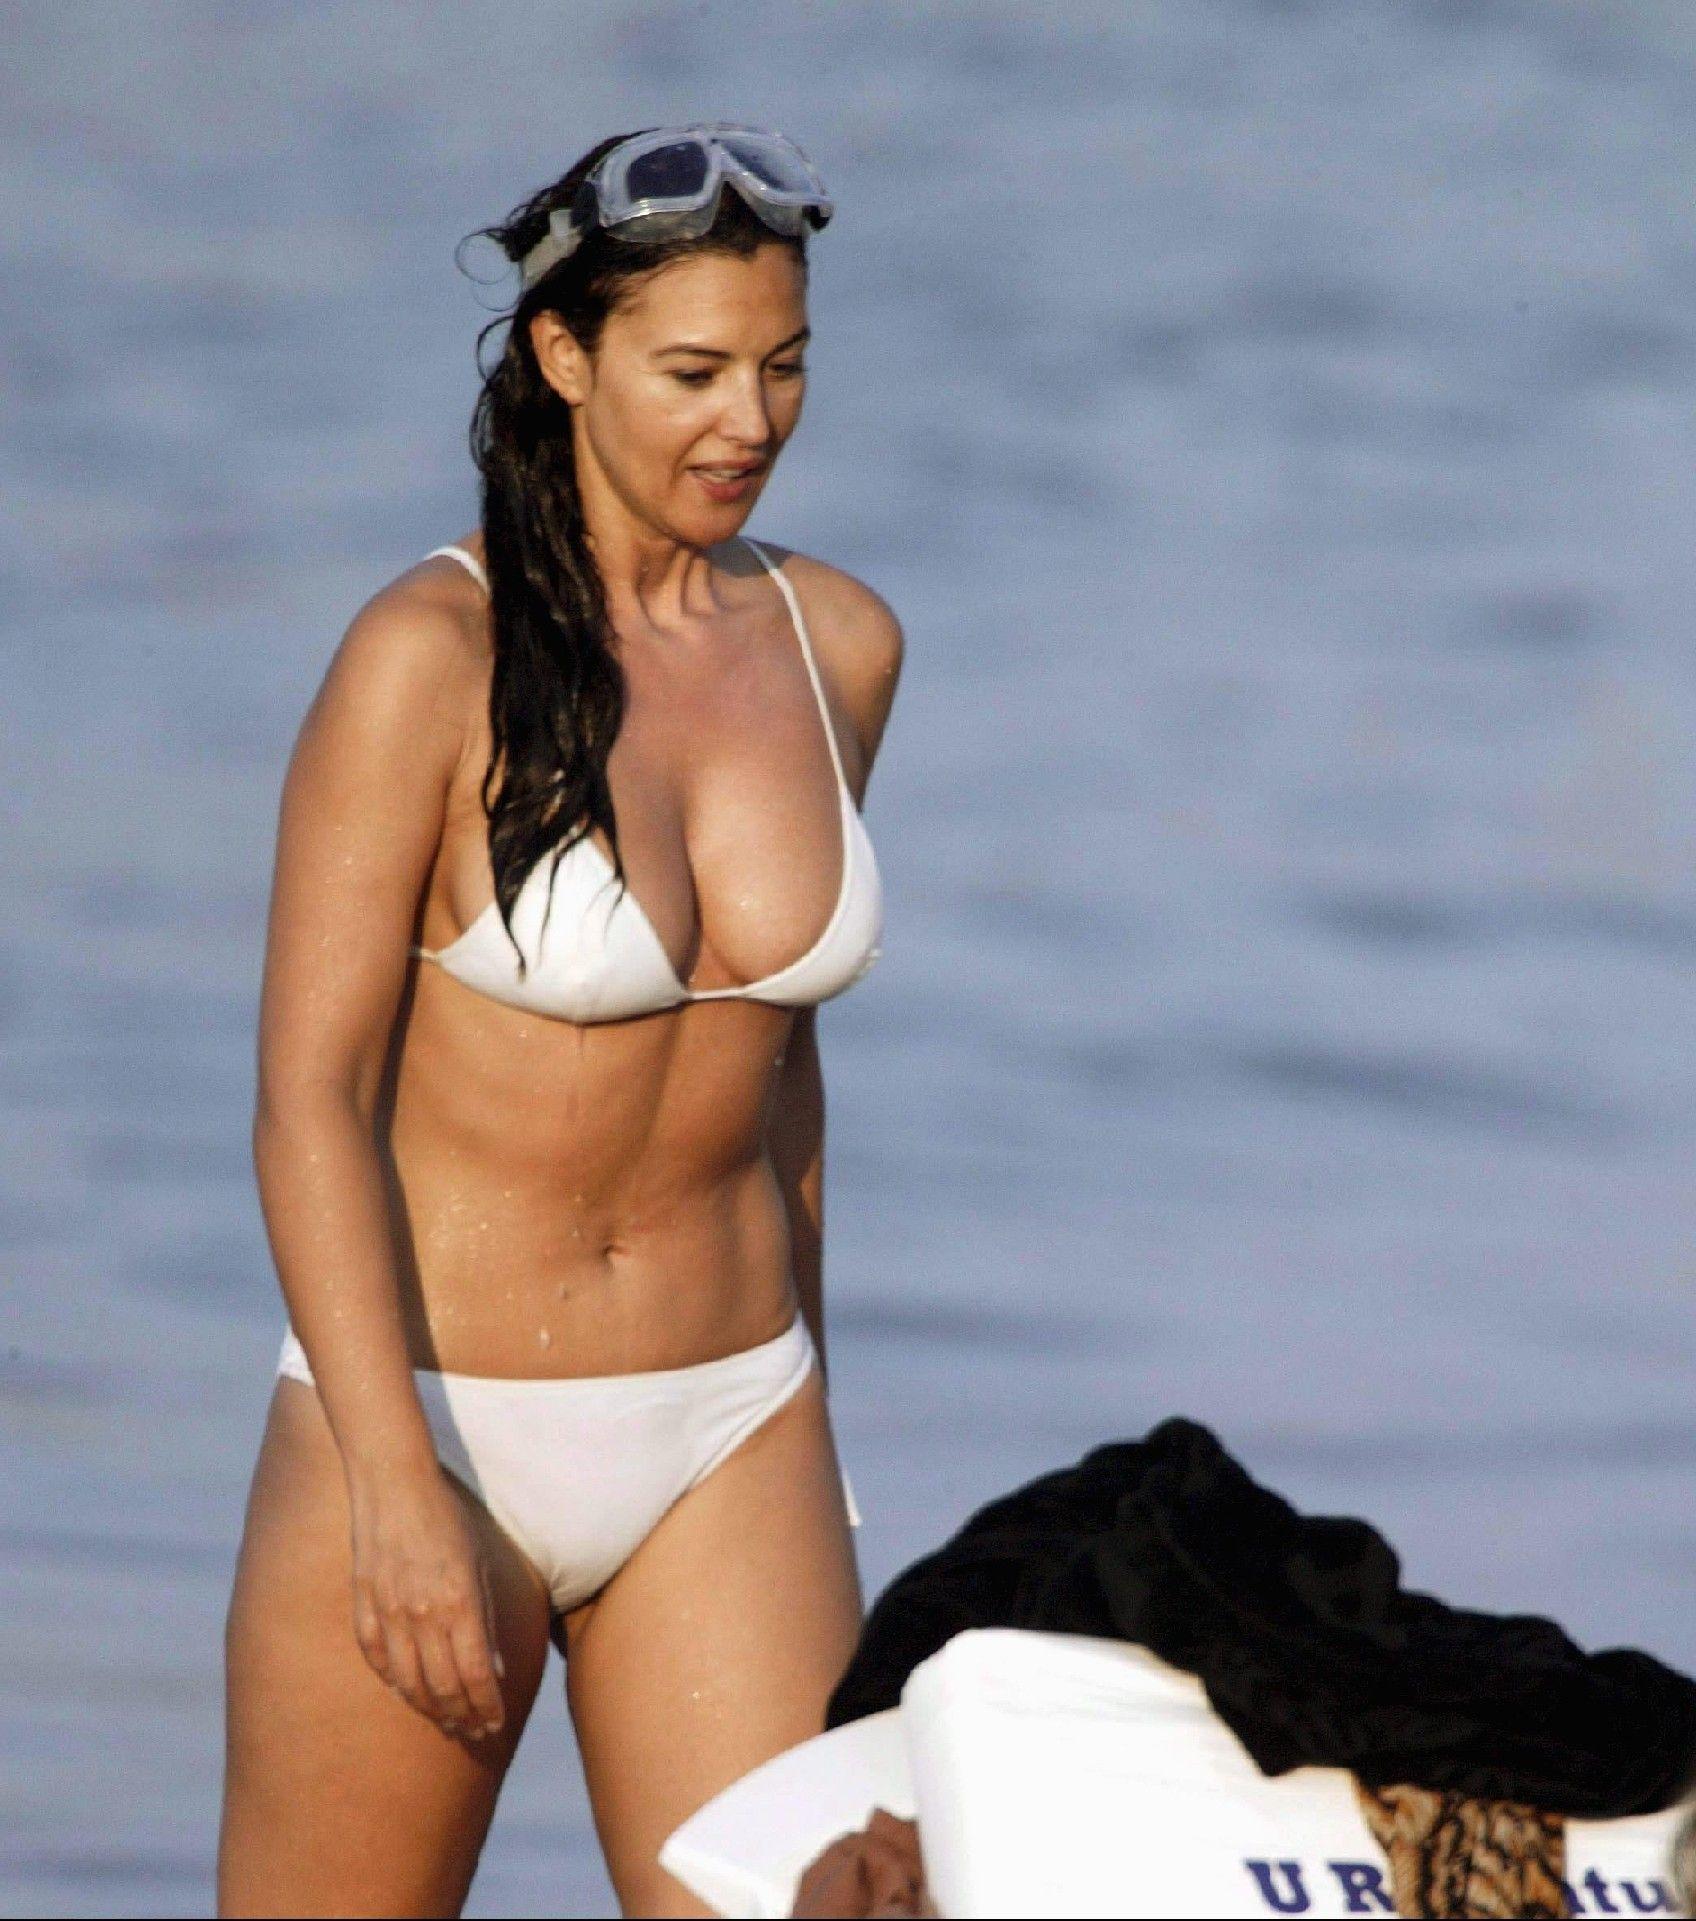 Monica Bellucci | Monica bellucci bikini, Monica bellucci, Monica bellucci young